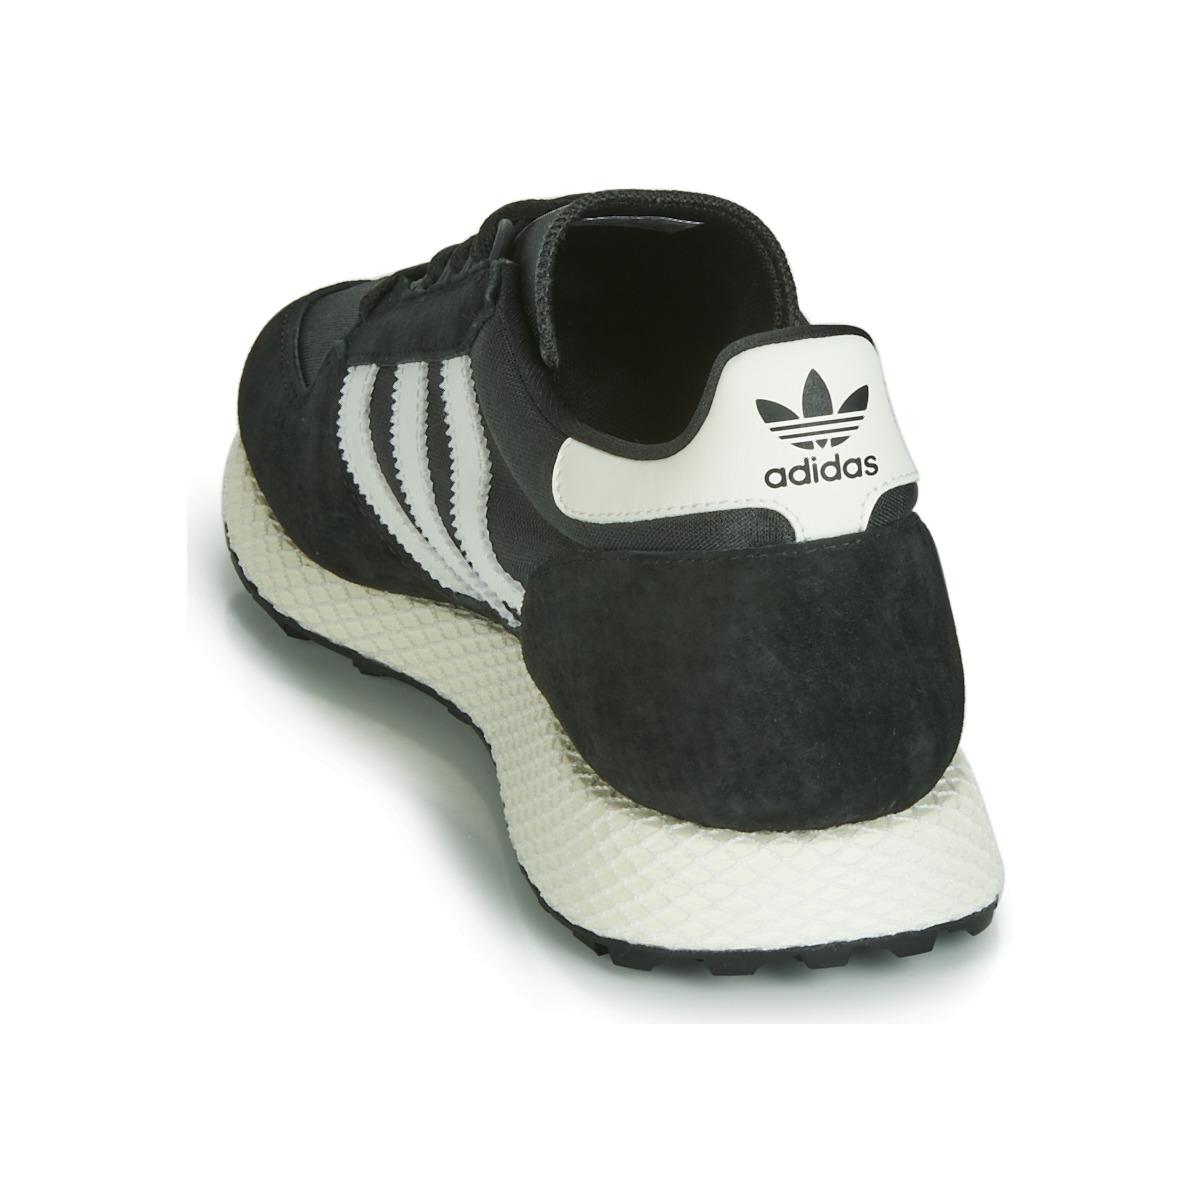 adidas forest grove scarpe donna